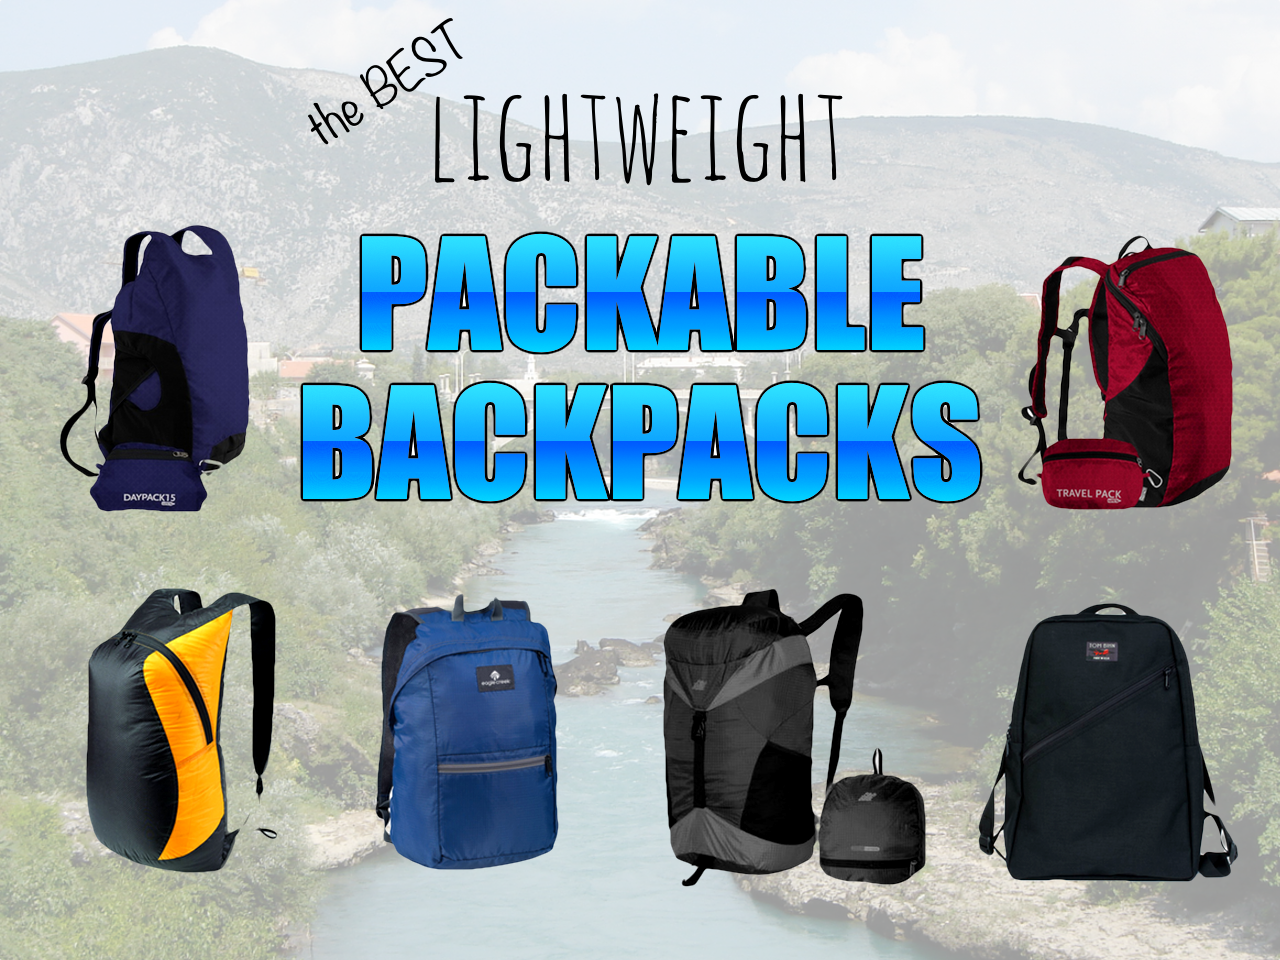 The Best Lightweight Packable Backpacks